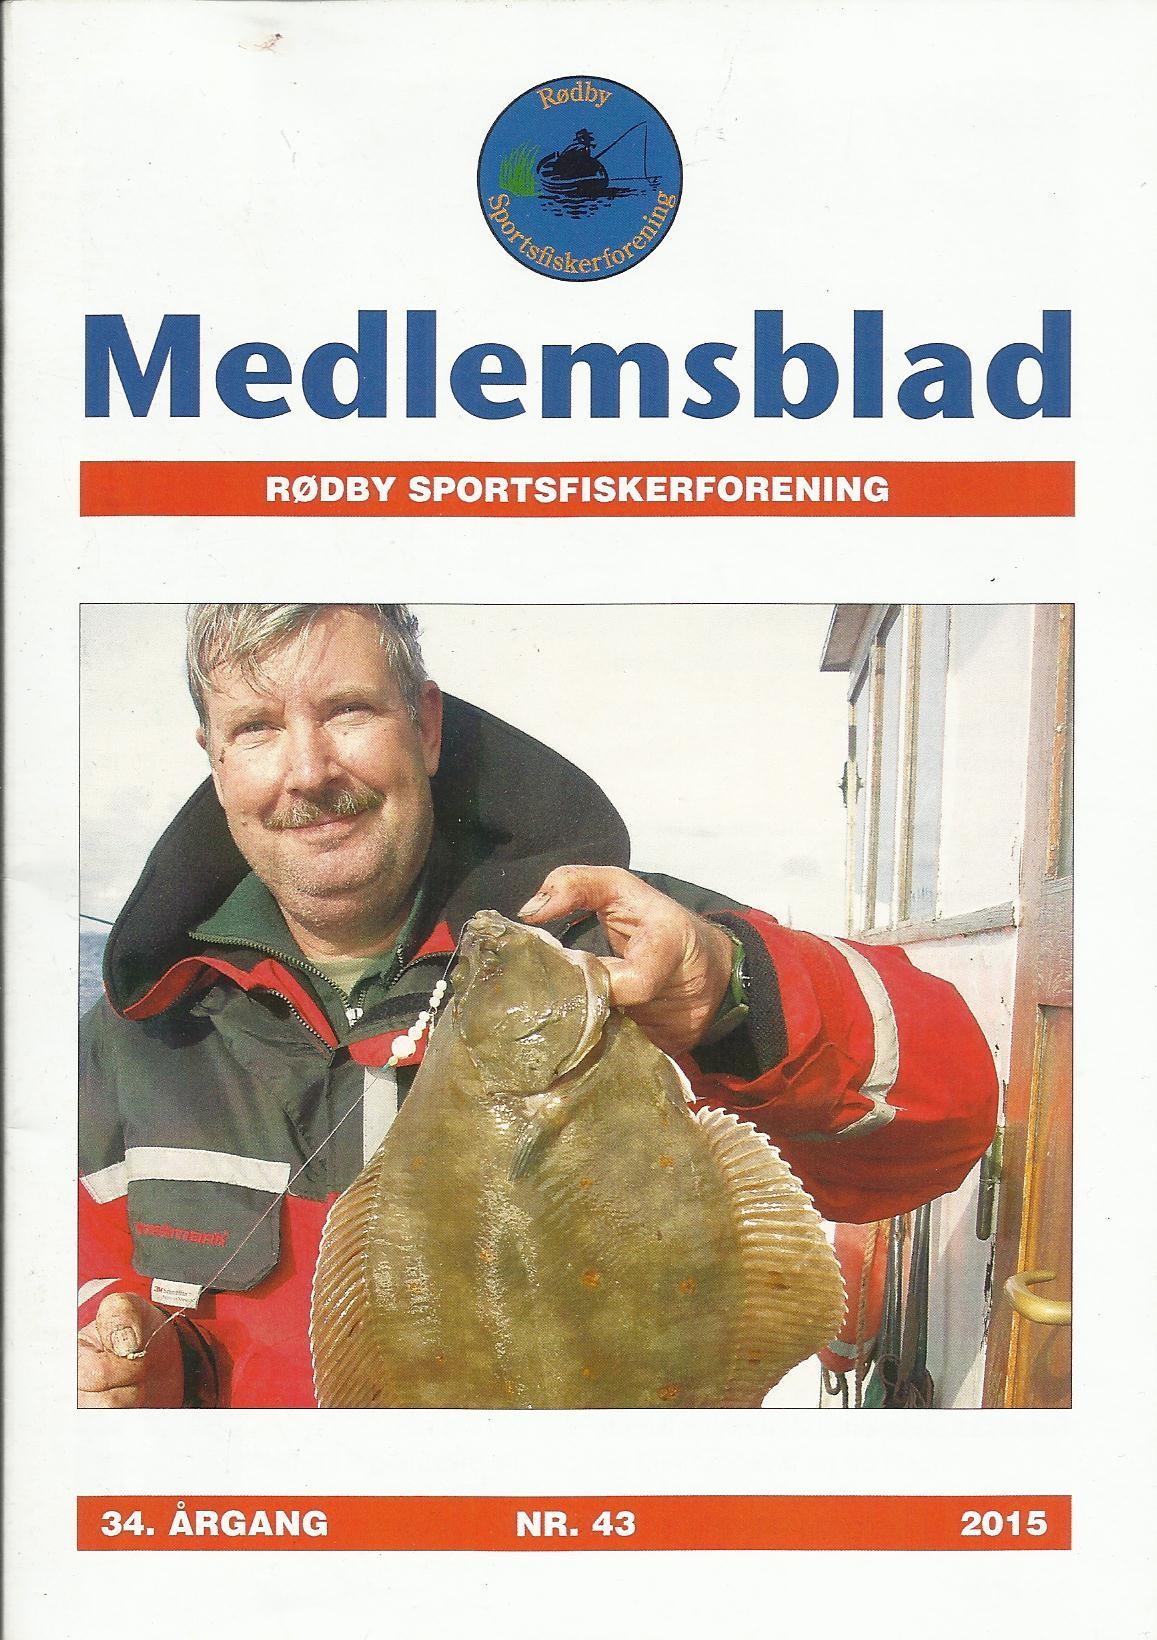 Rødby Sportsfiskerforening